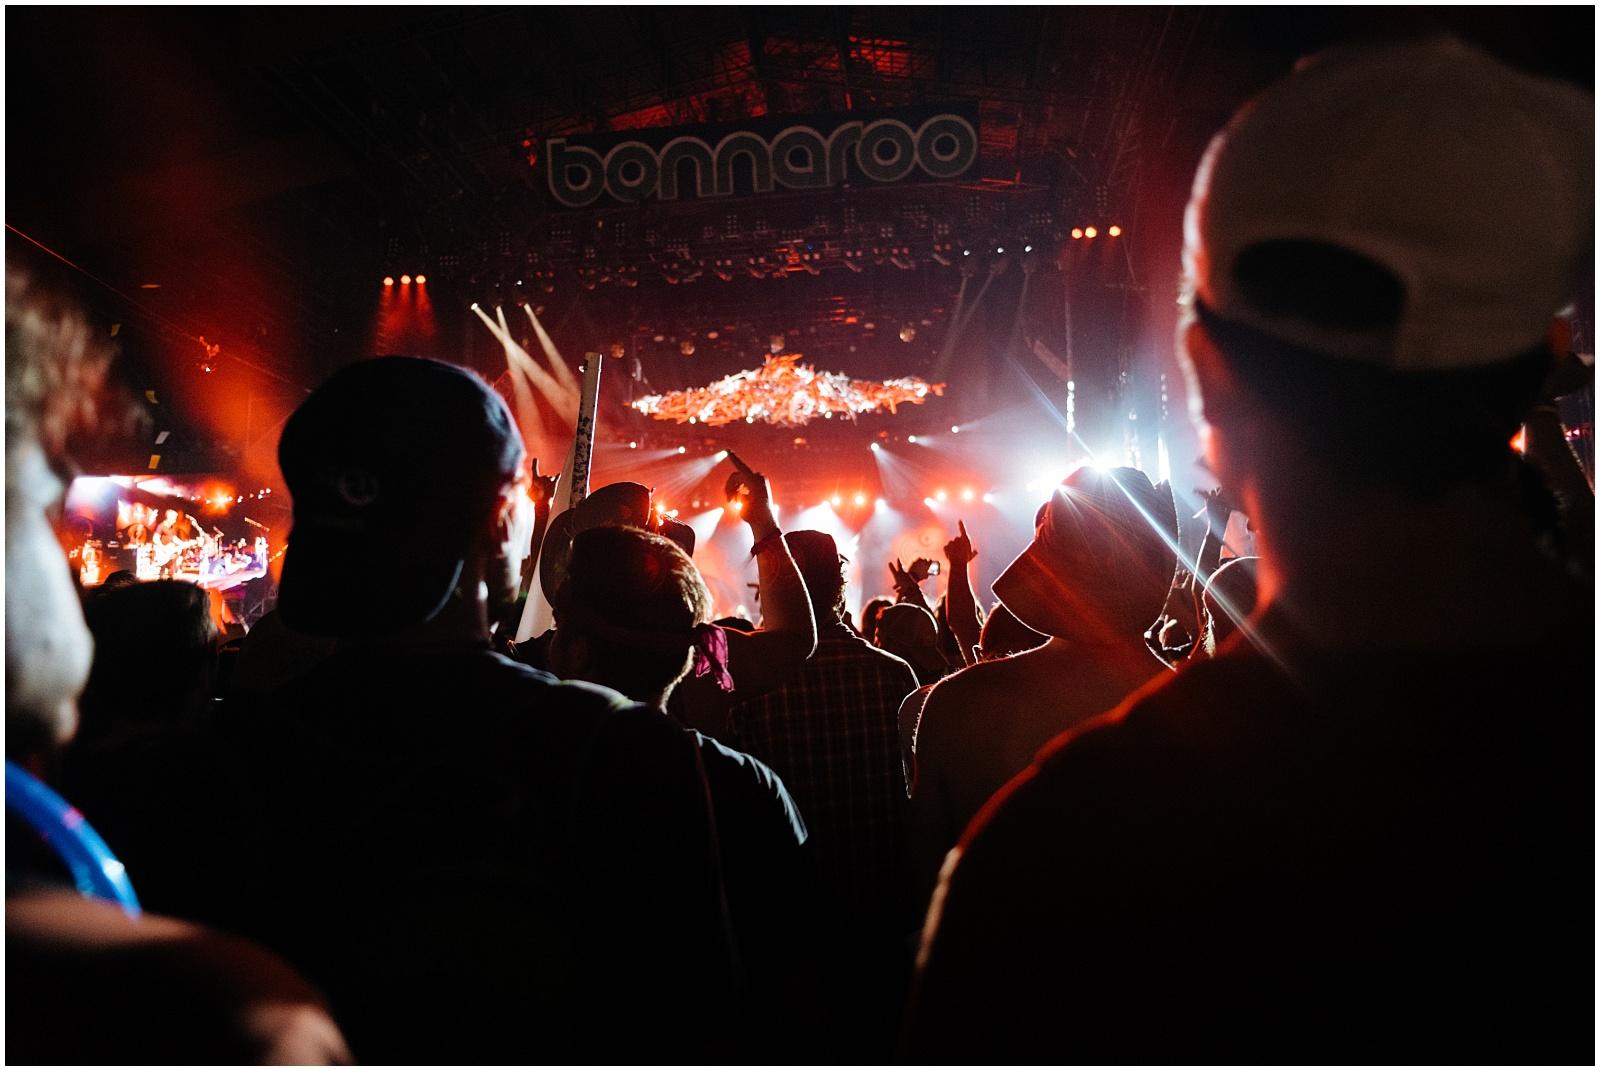 Pearl Jam at Bonnaroo in Manchester TN